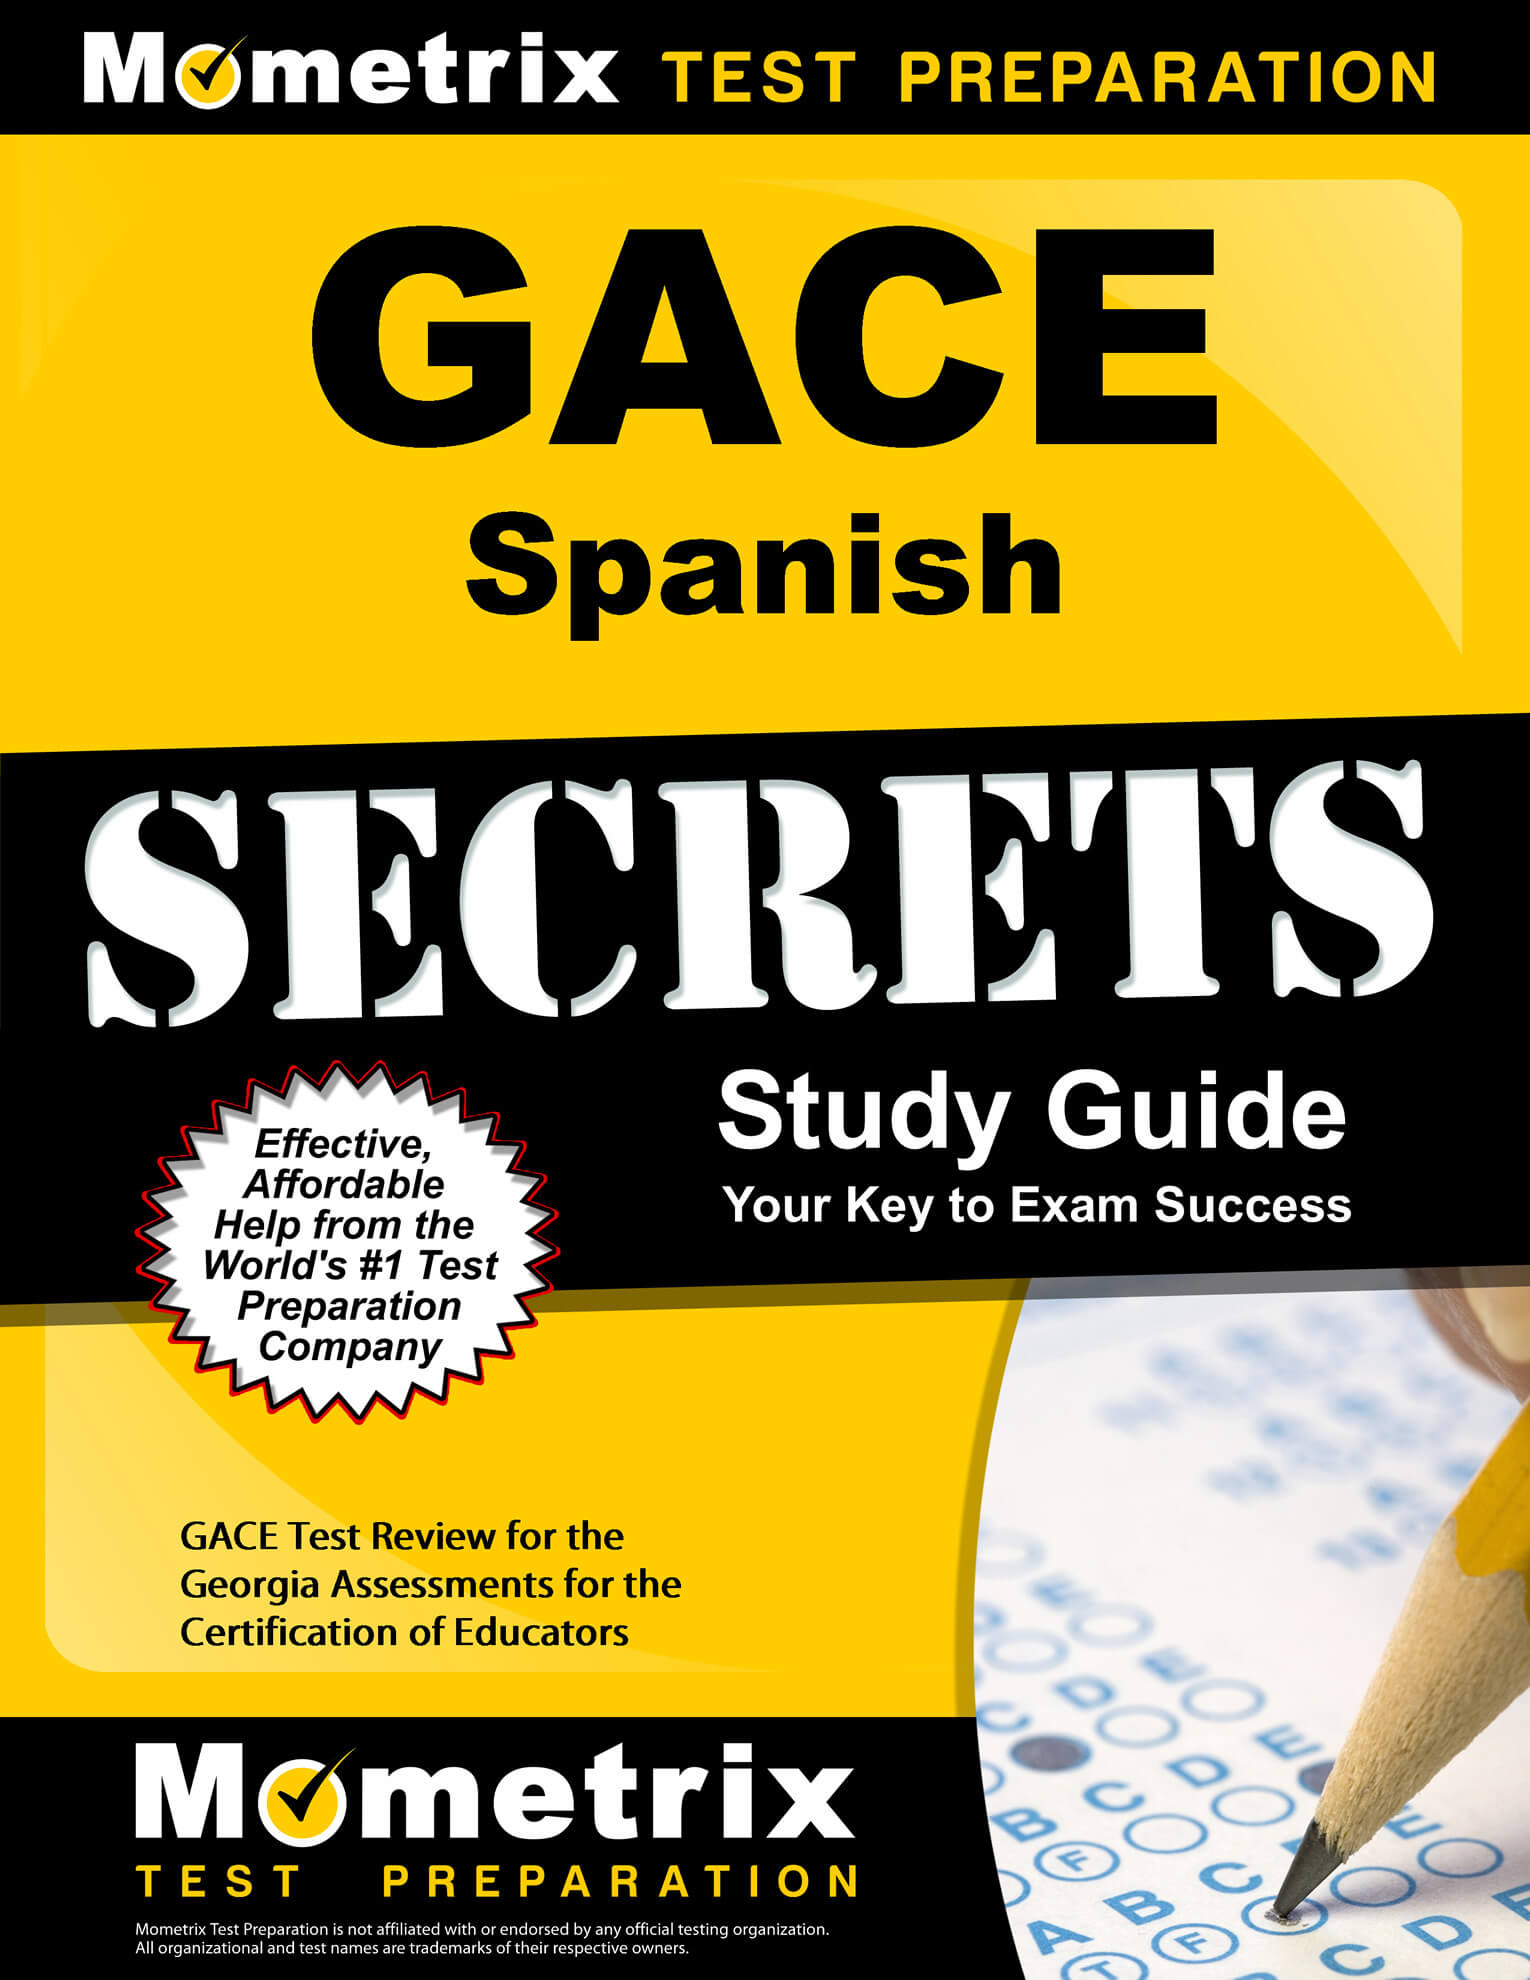 GACE Spanish Study Guide